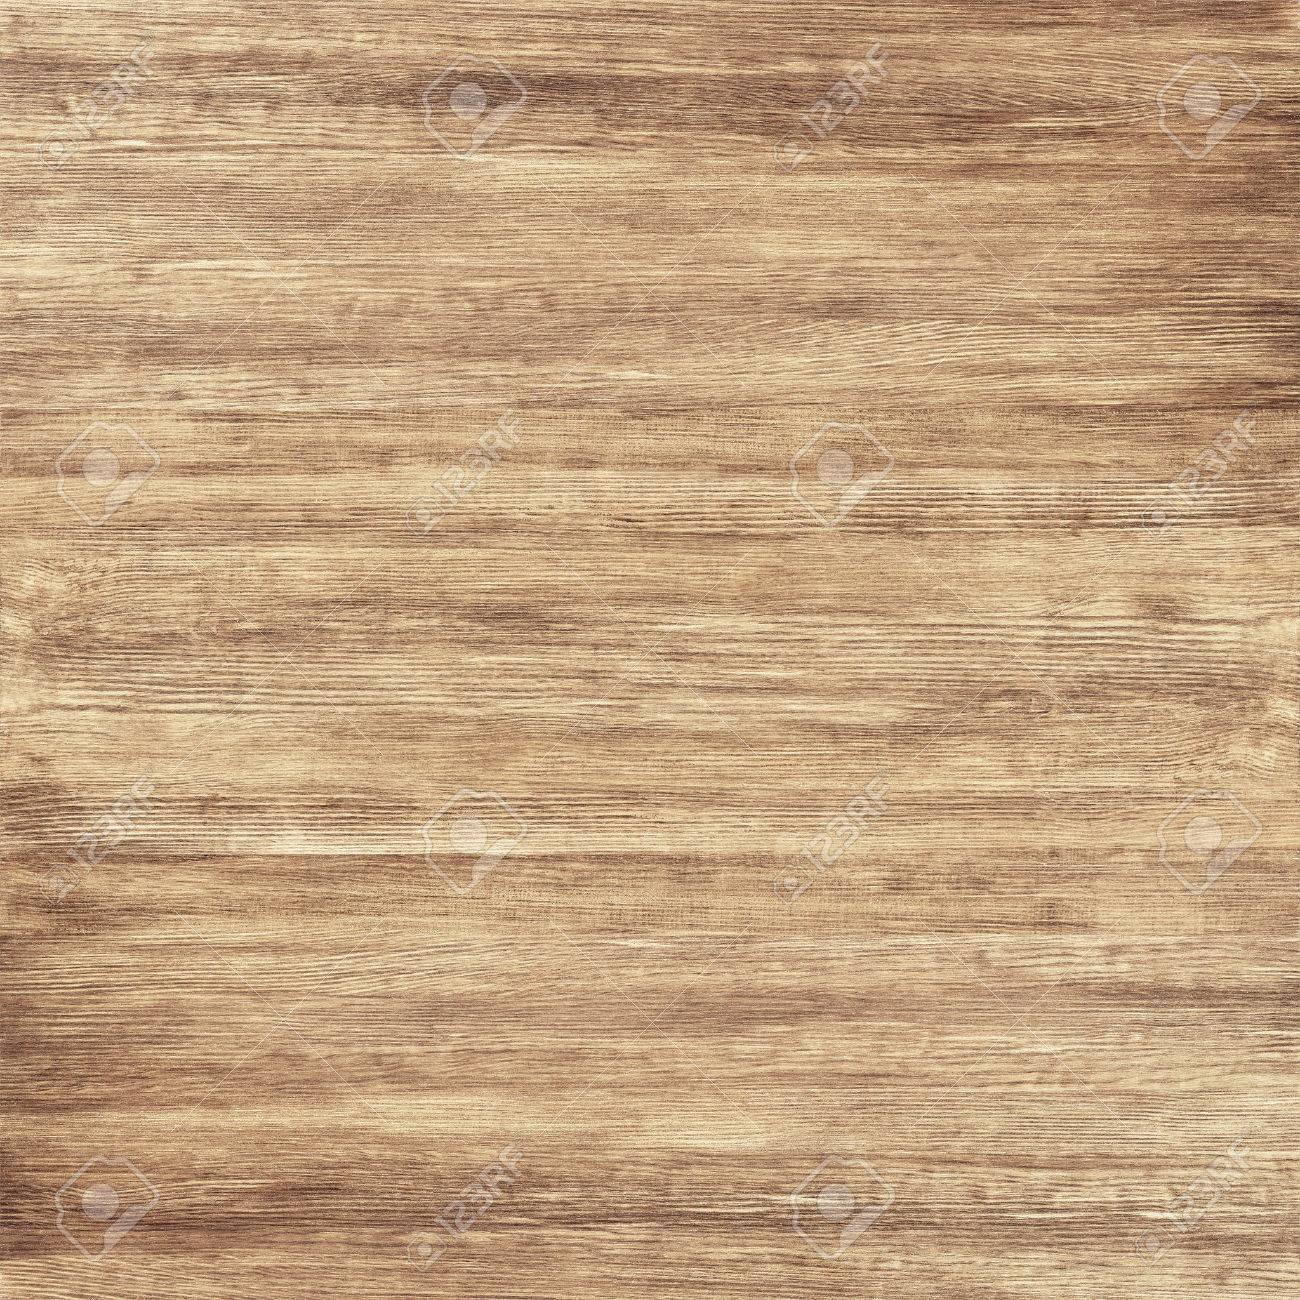 Wooden texture, yellow crisp wood background Stock Photo - 48054377